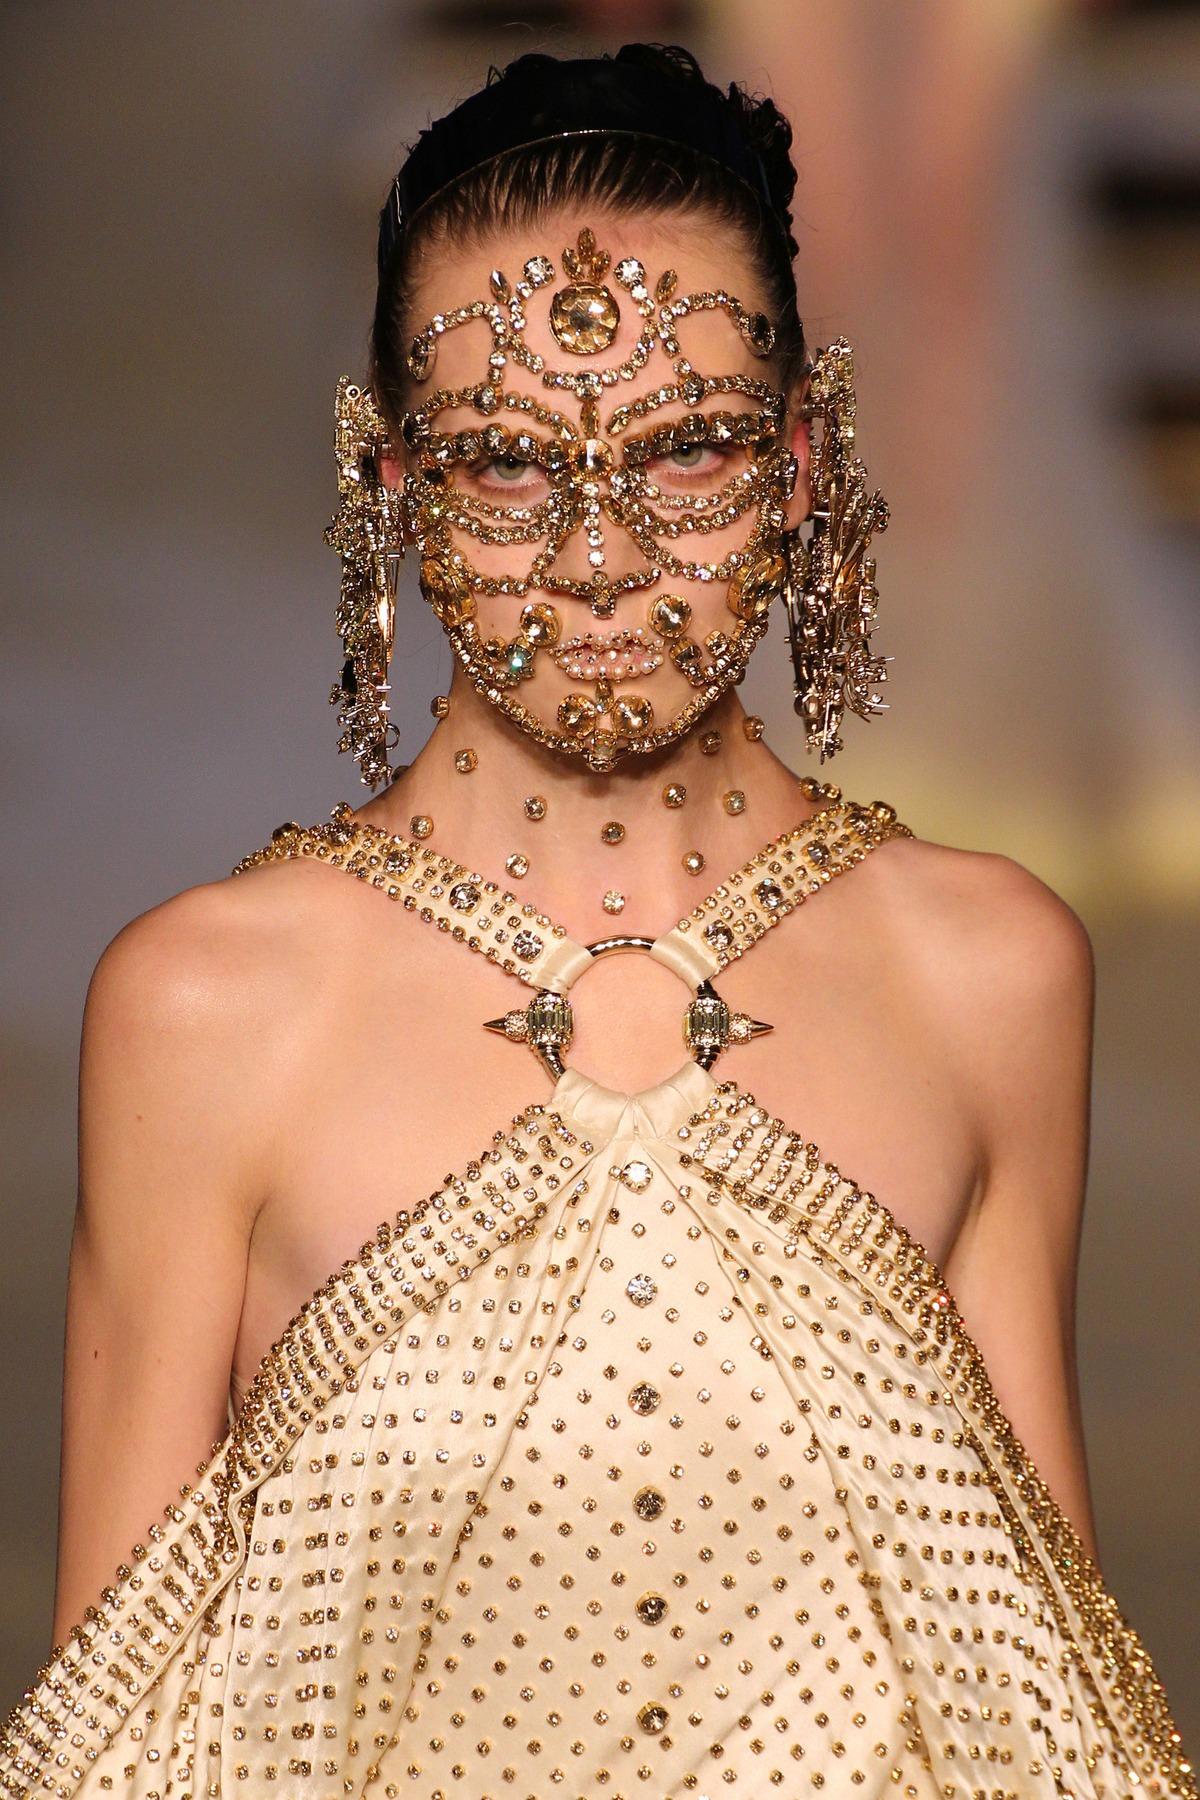 Givenchy makeup SS16 19